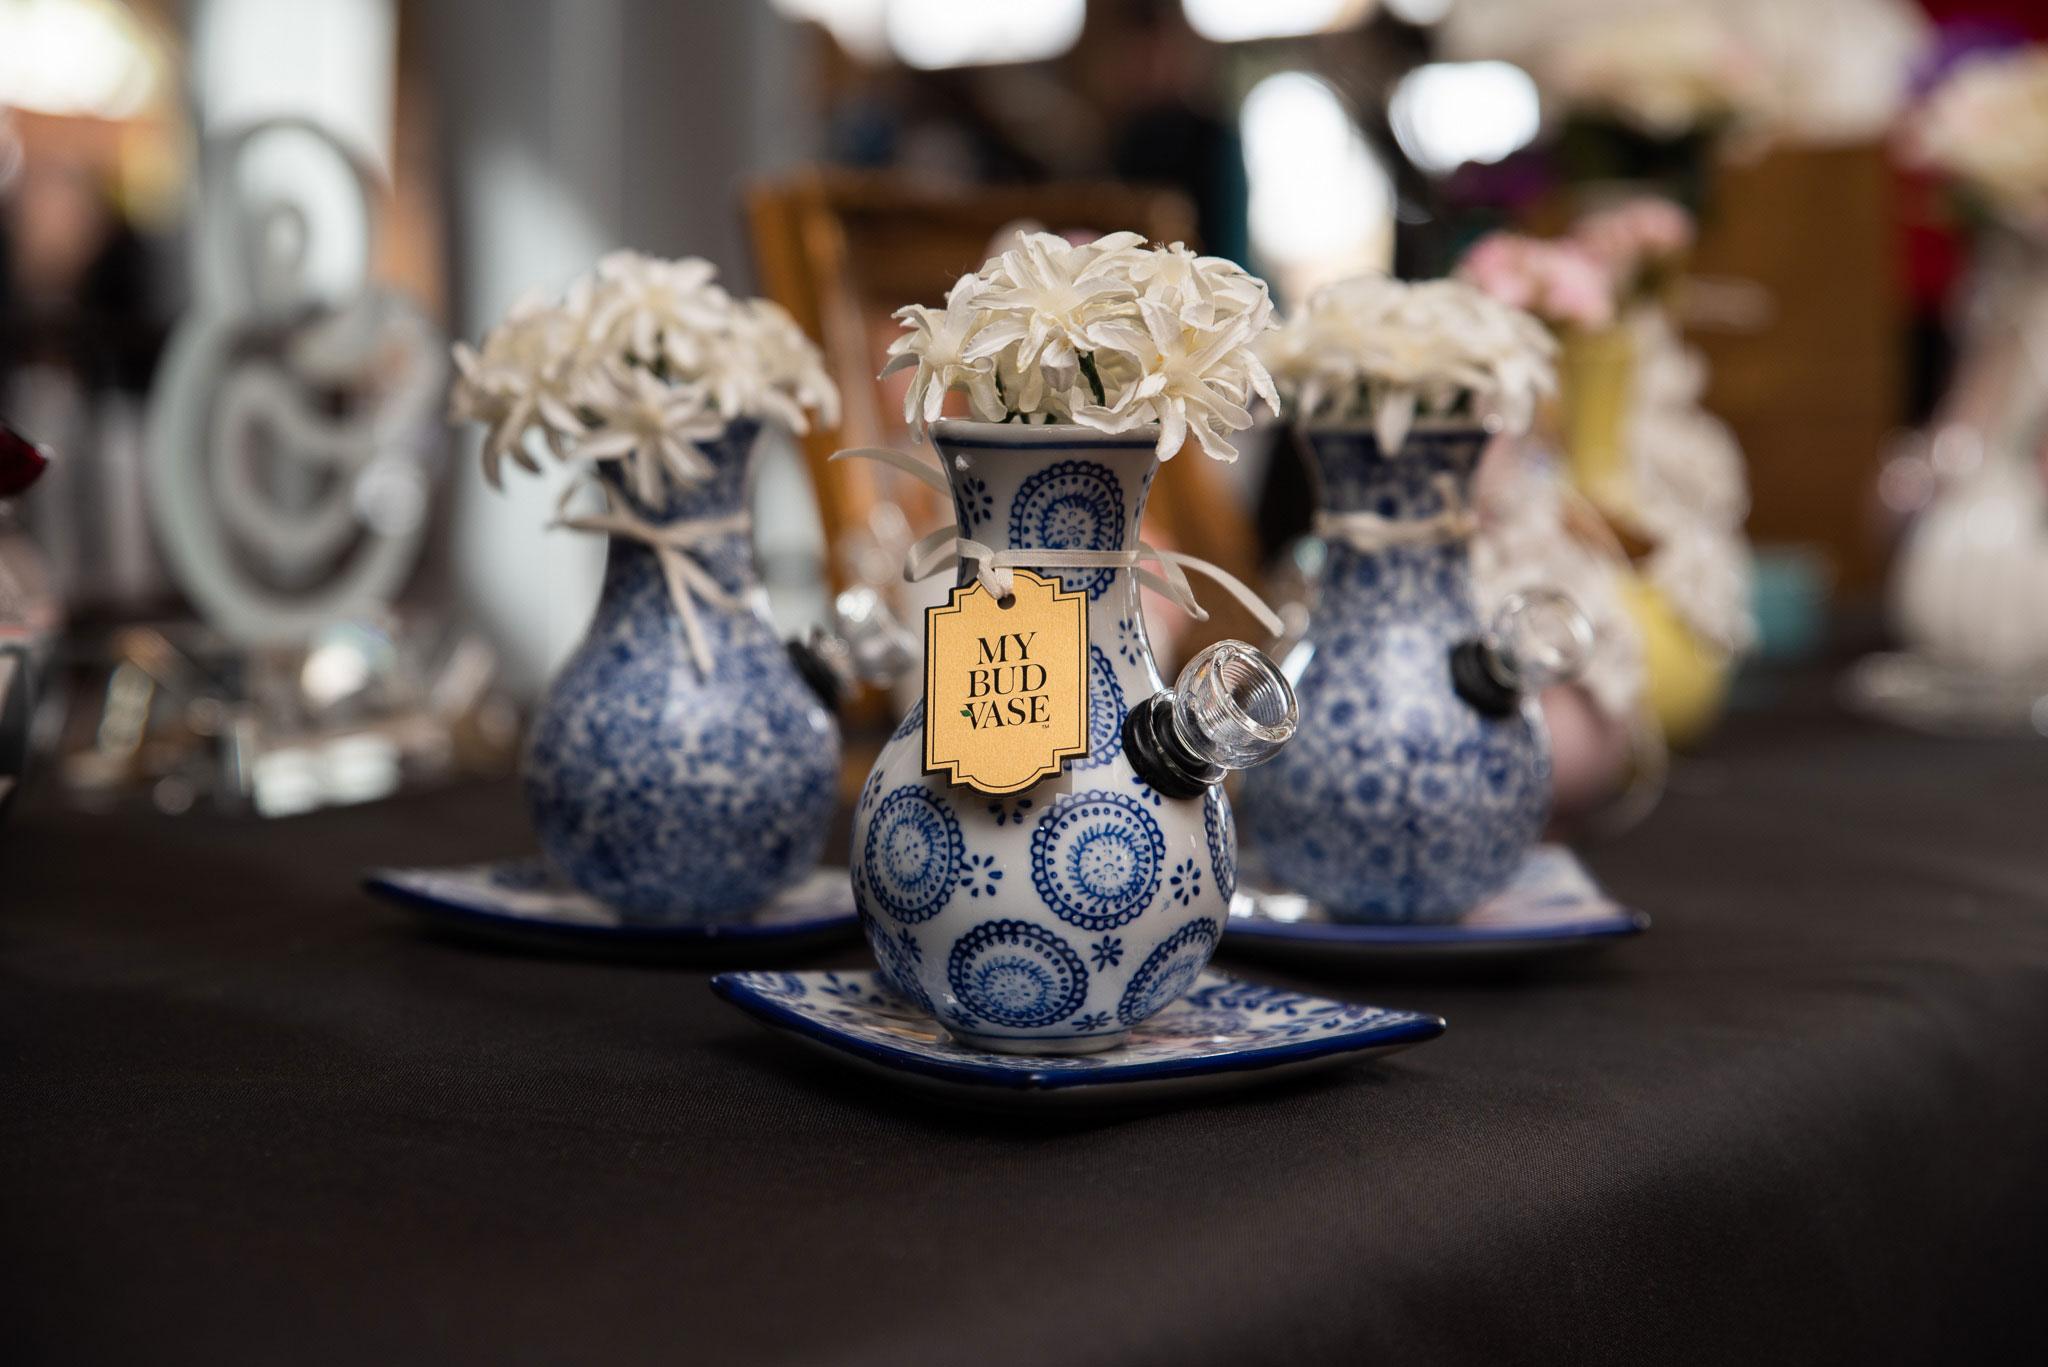 My Bud Vase at the Cannabis Wedding Expo in Denver, Colorado. Photo by Kenesha Facello.